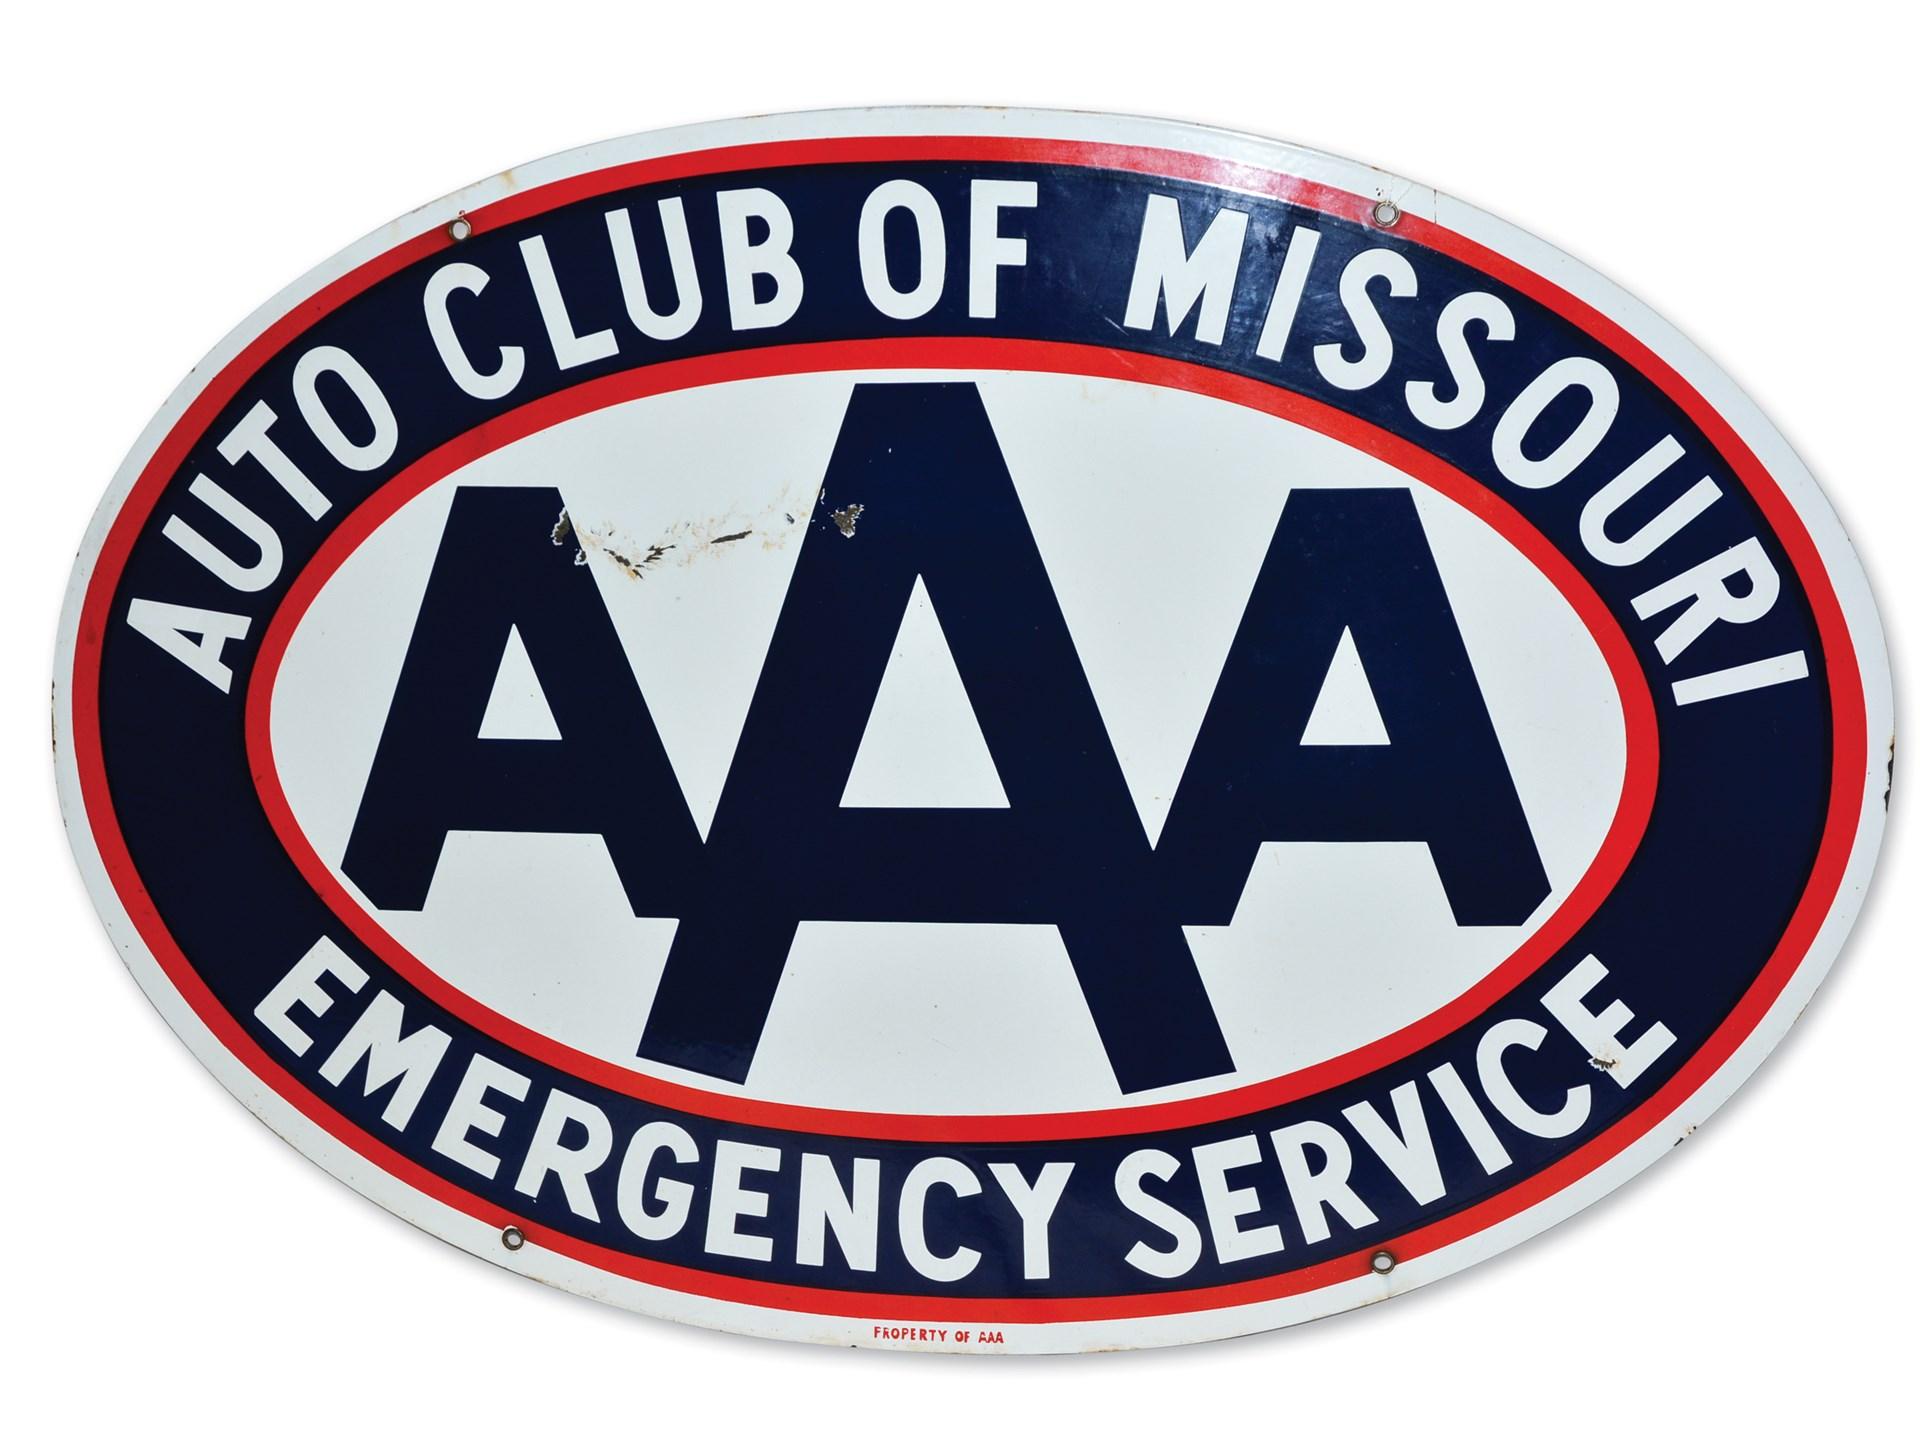 Aaa Auto Club Near Me >> Rm Sotheby S Aaa Auto Club Of Missouri Emergency Service Sign